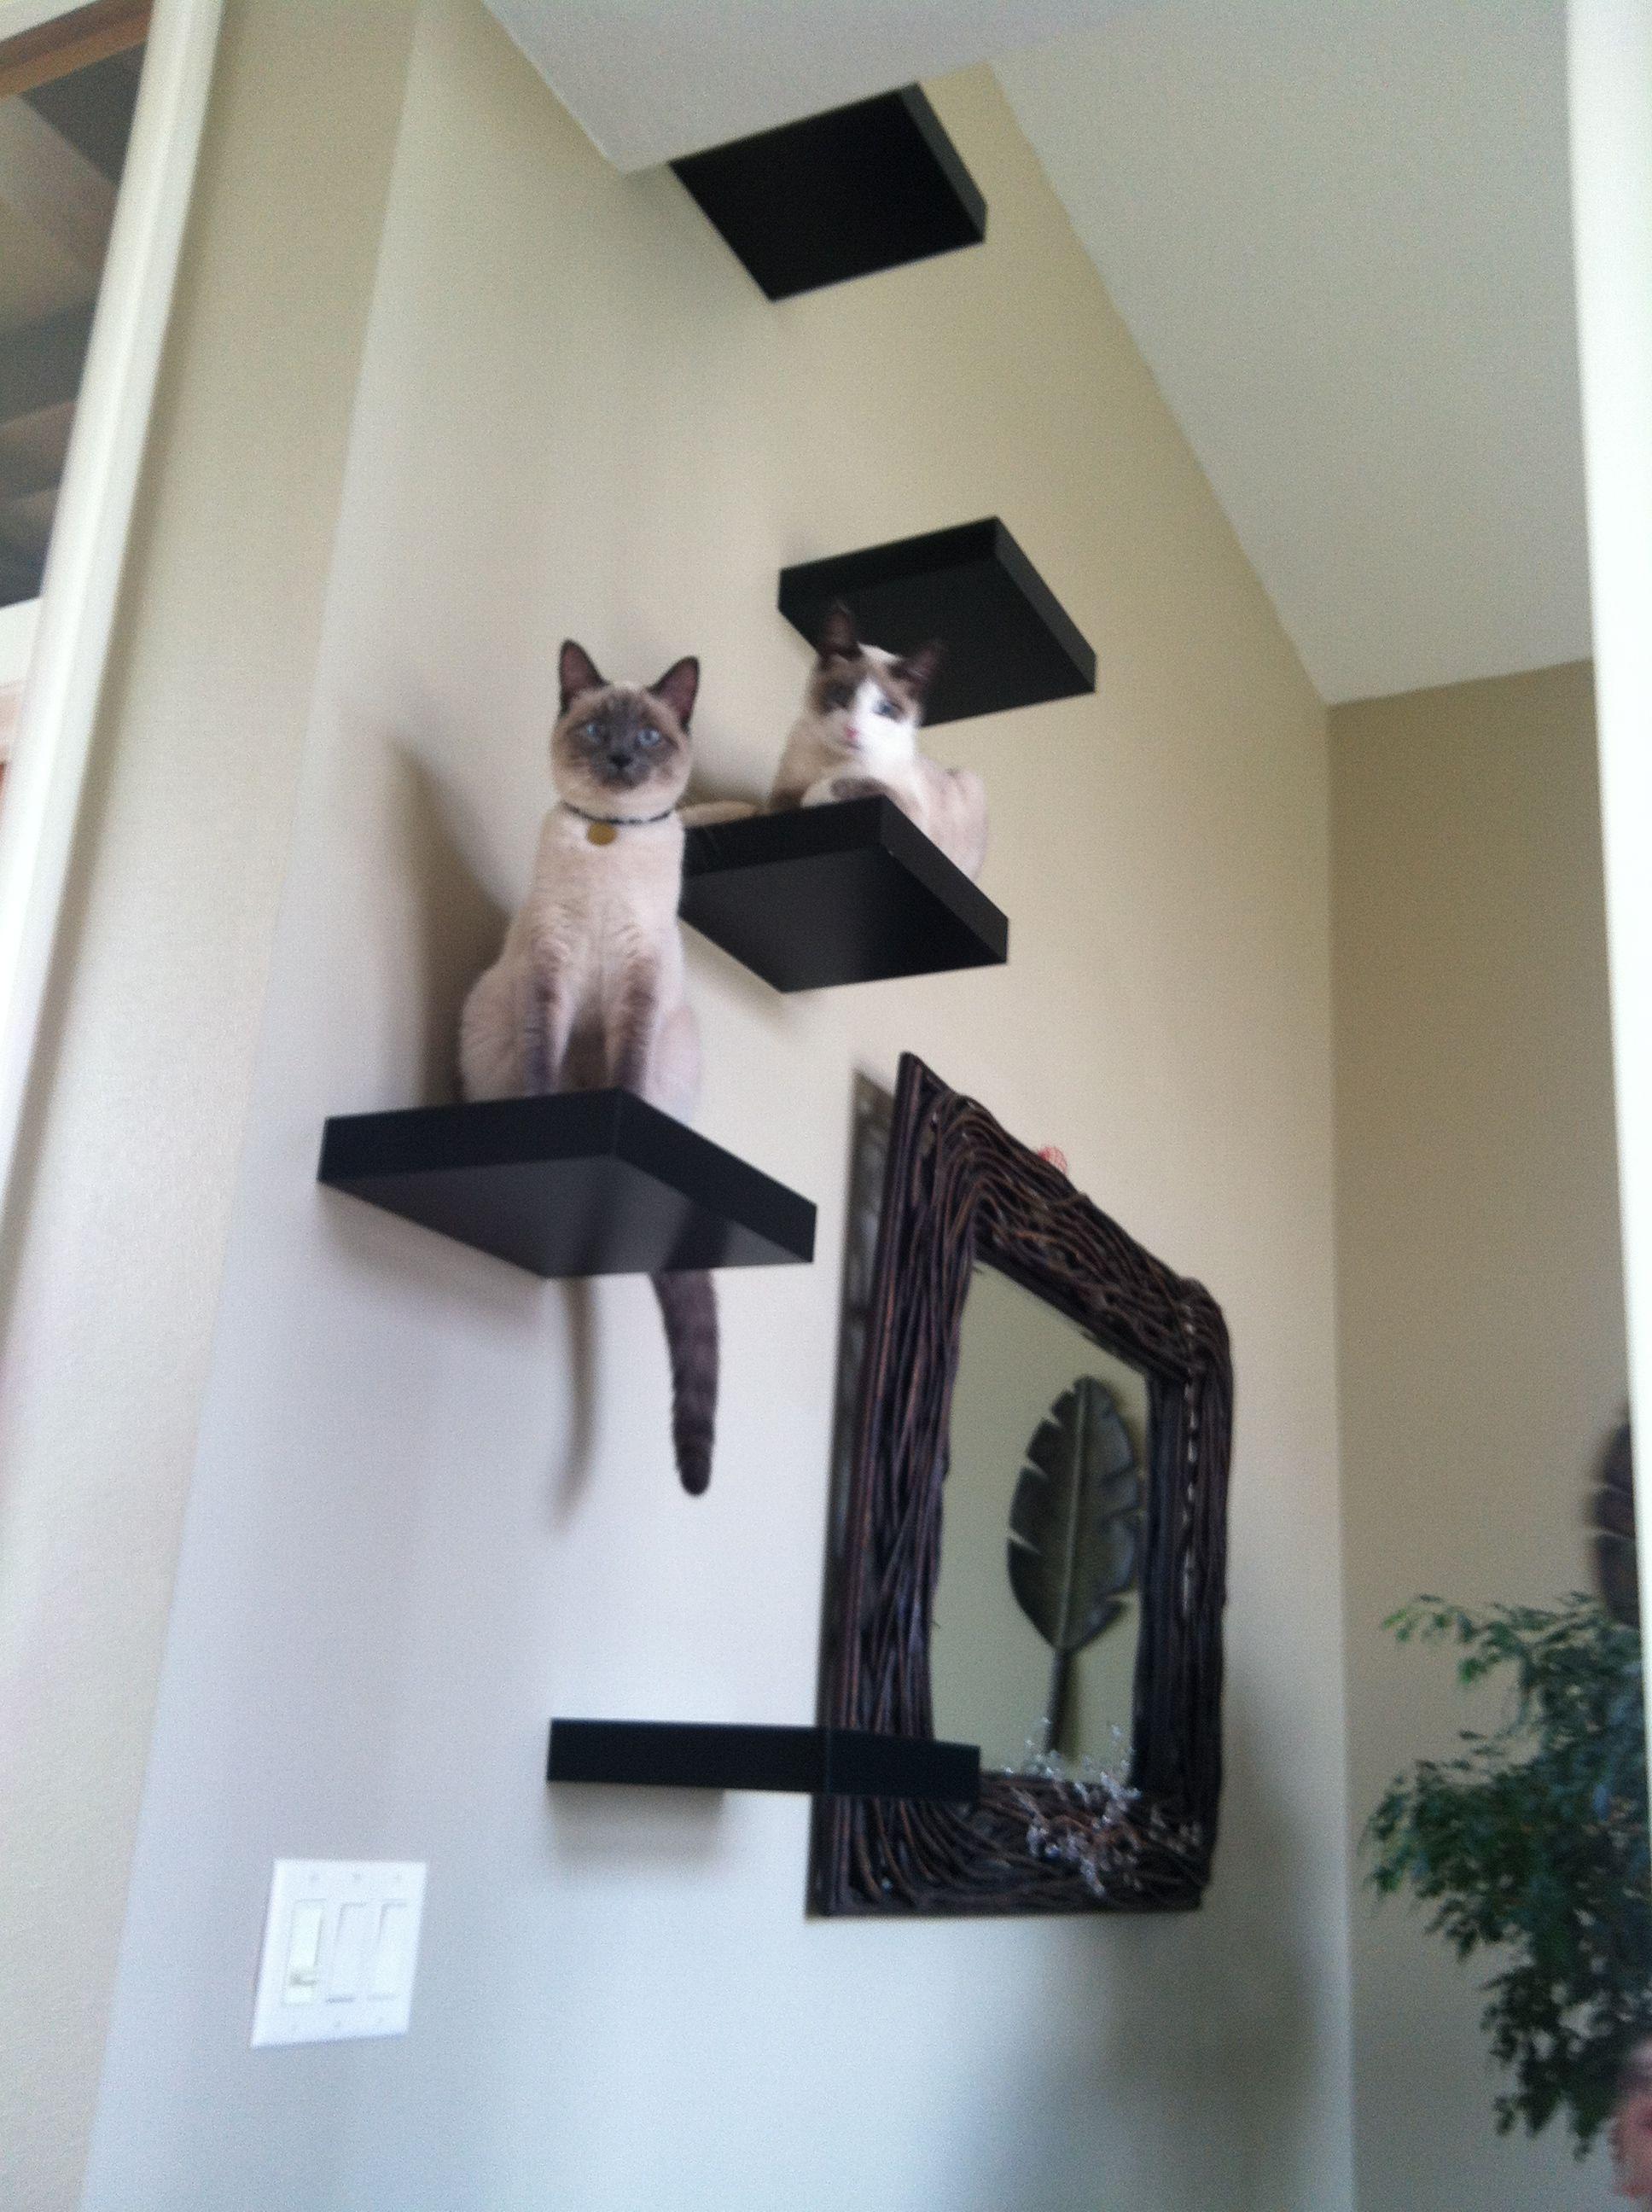 Us Furniture And Home Furnishings Ikea Lack Shelves Cat